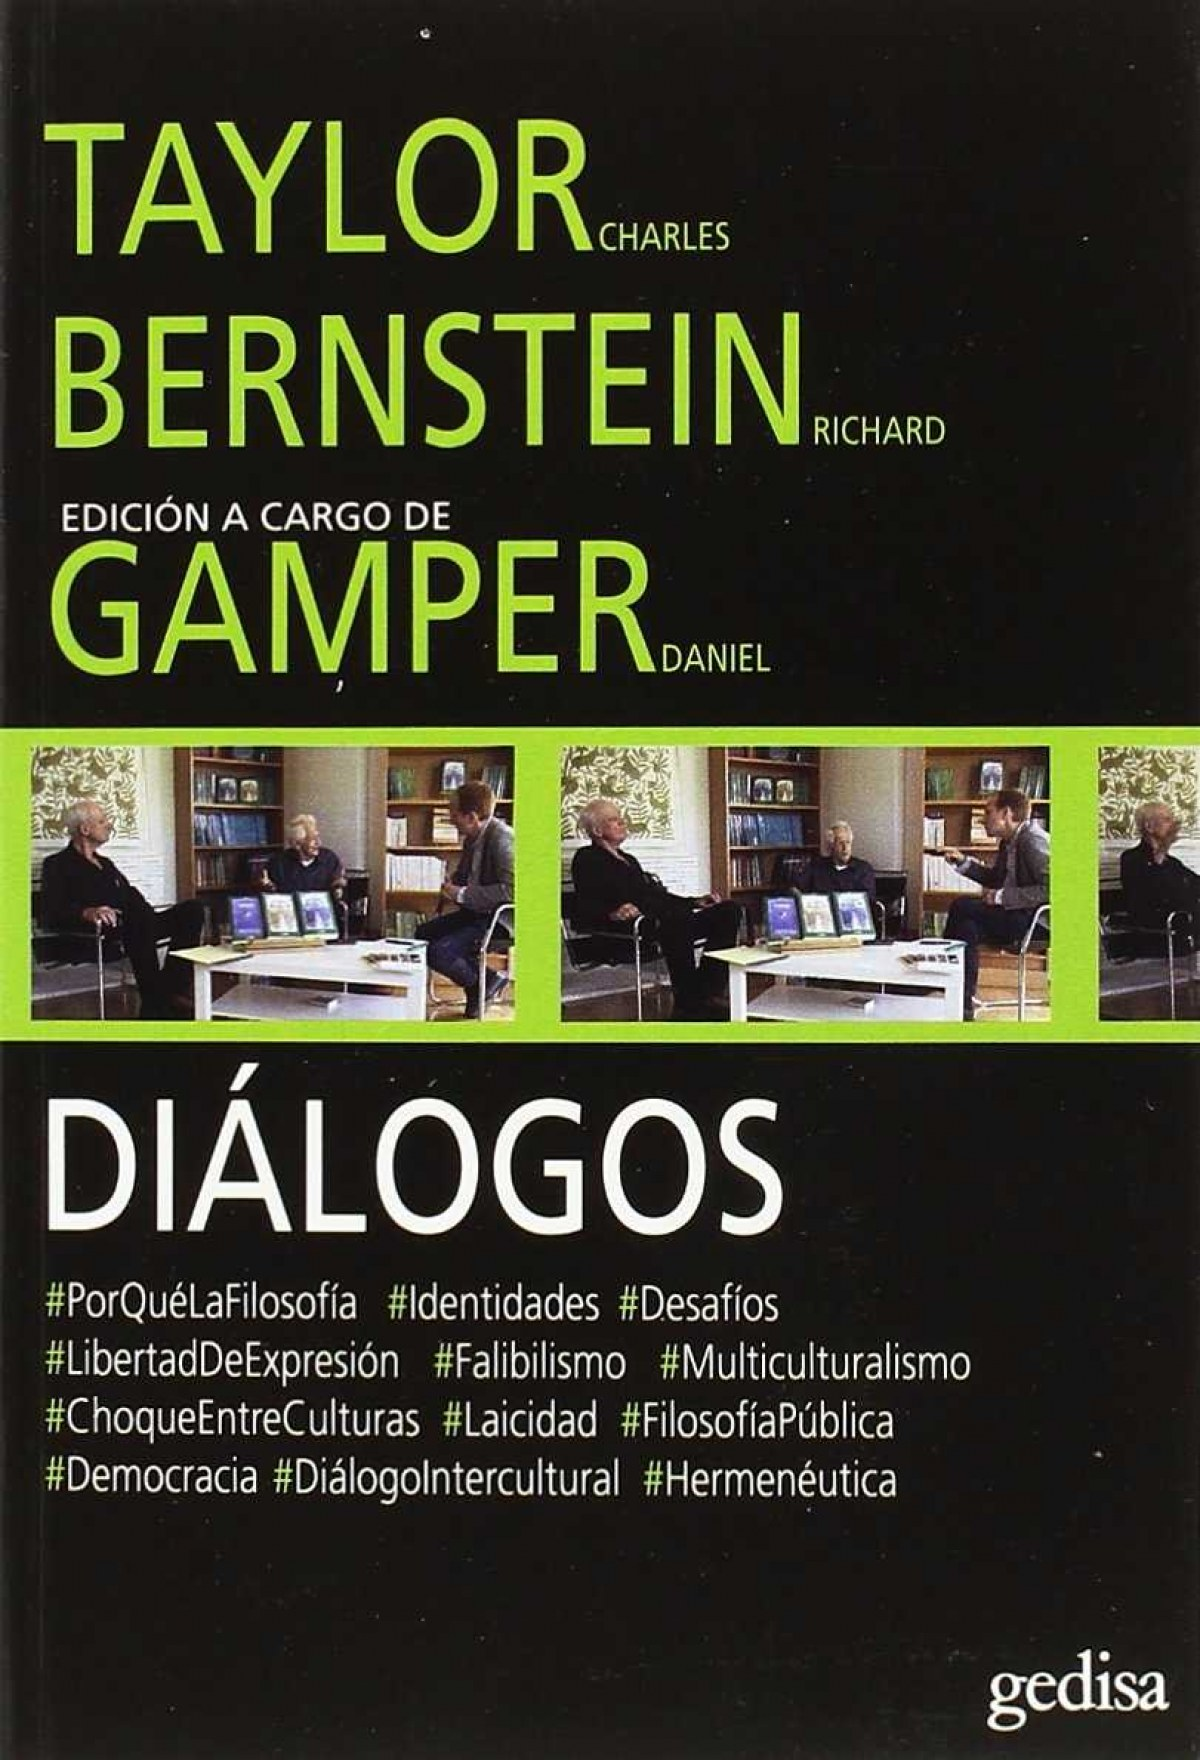 DIÁLOGOS TAYLOR - BERNSTEIN 9788497849968